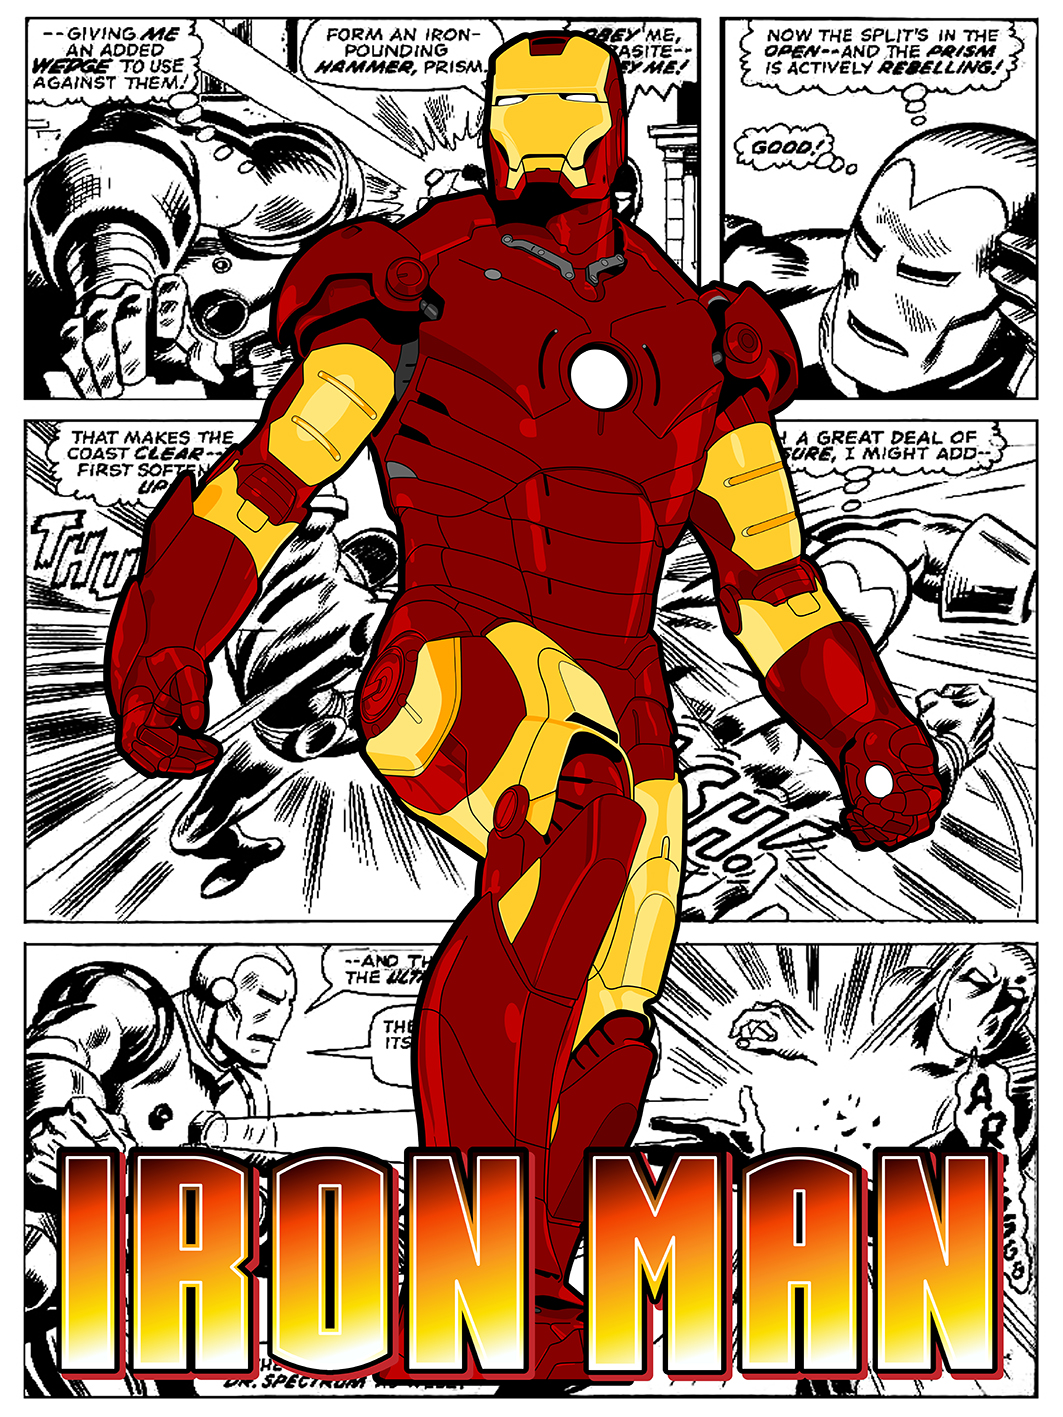 comic posters chris rhodes design